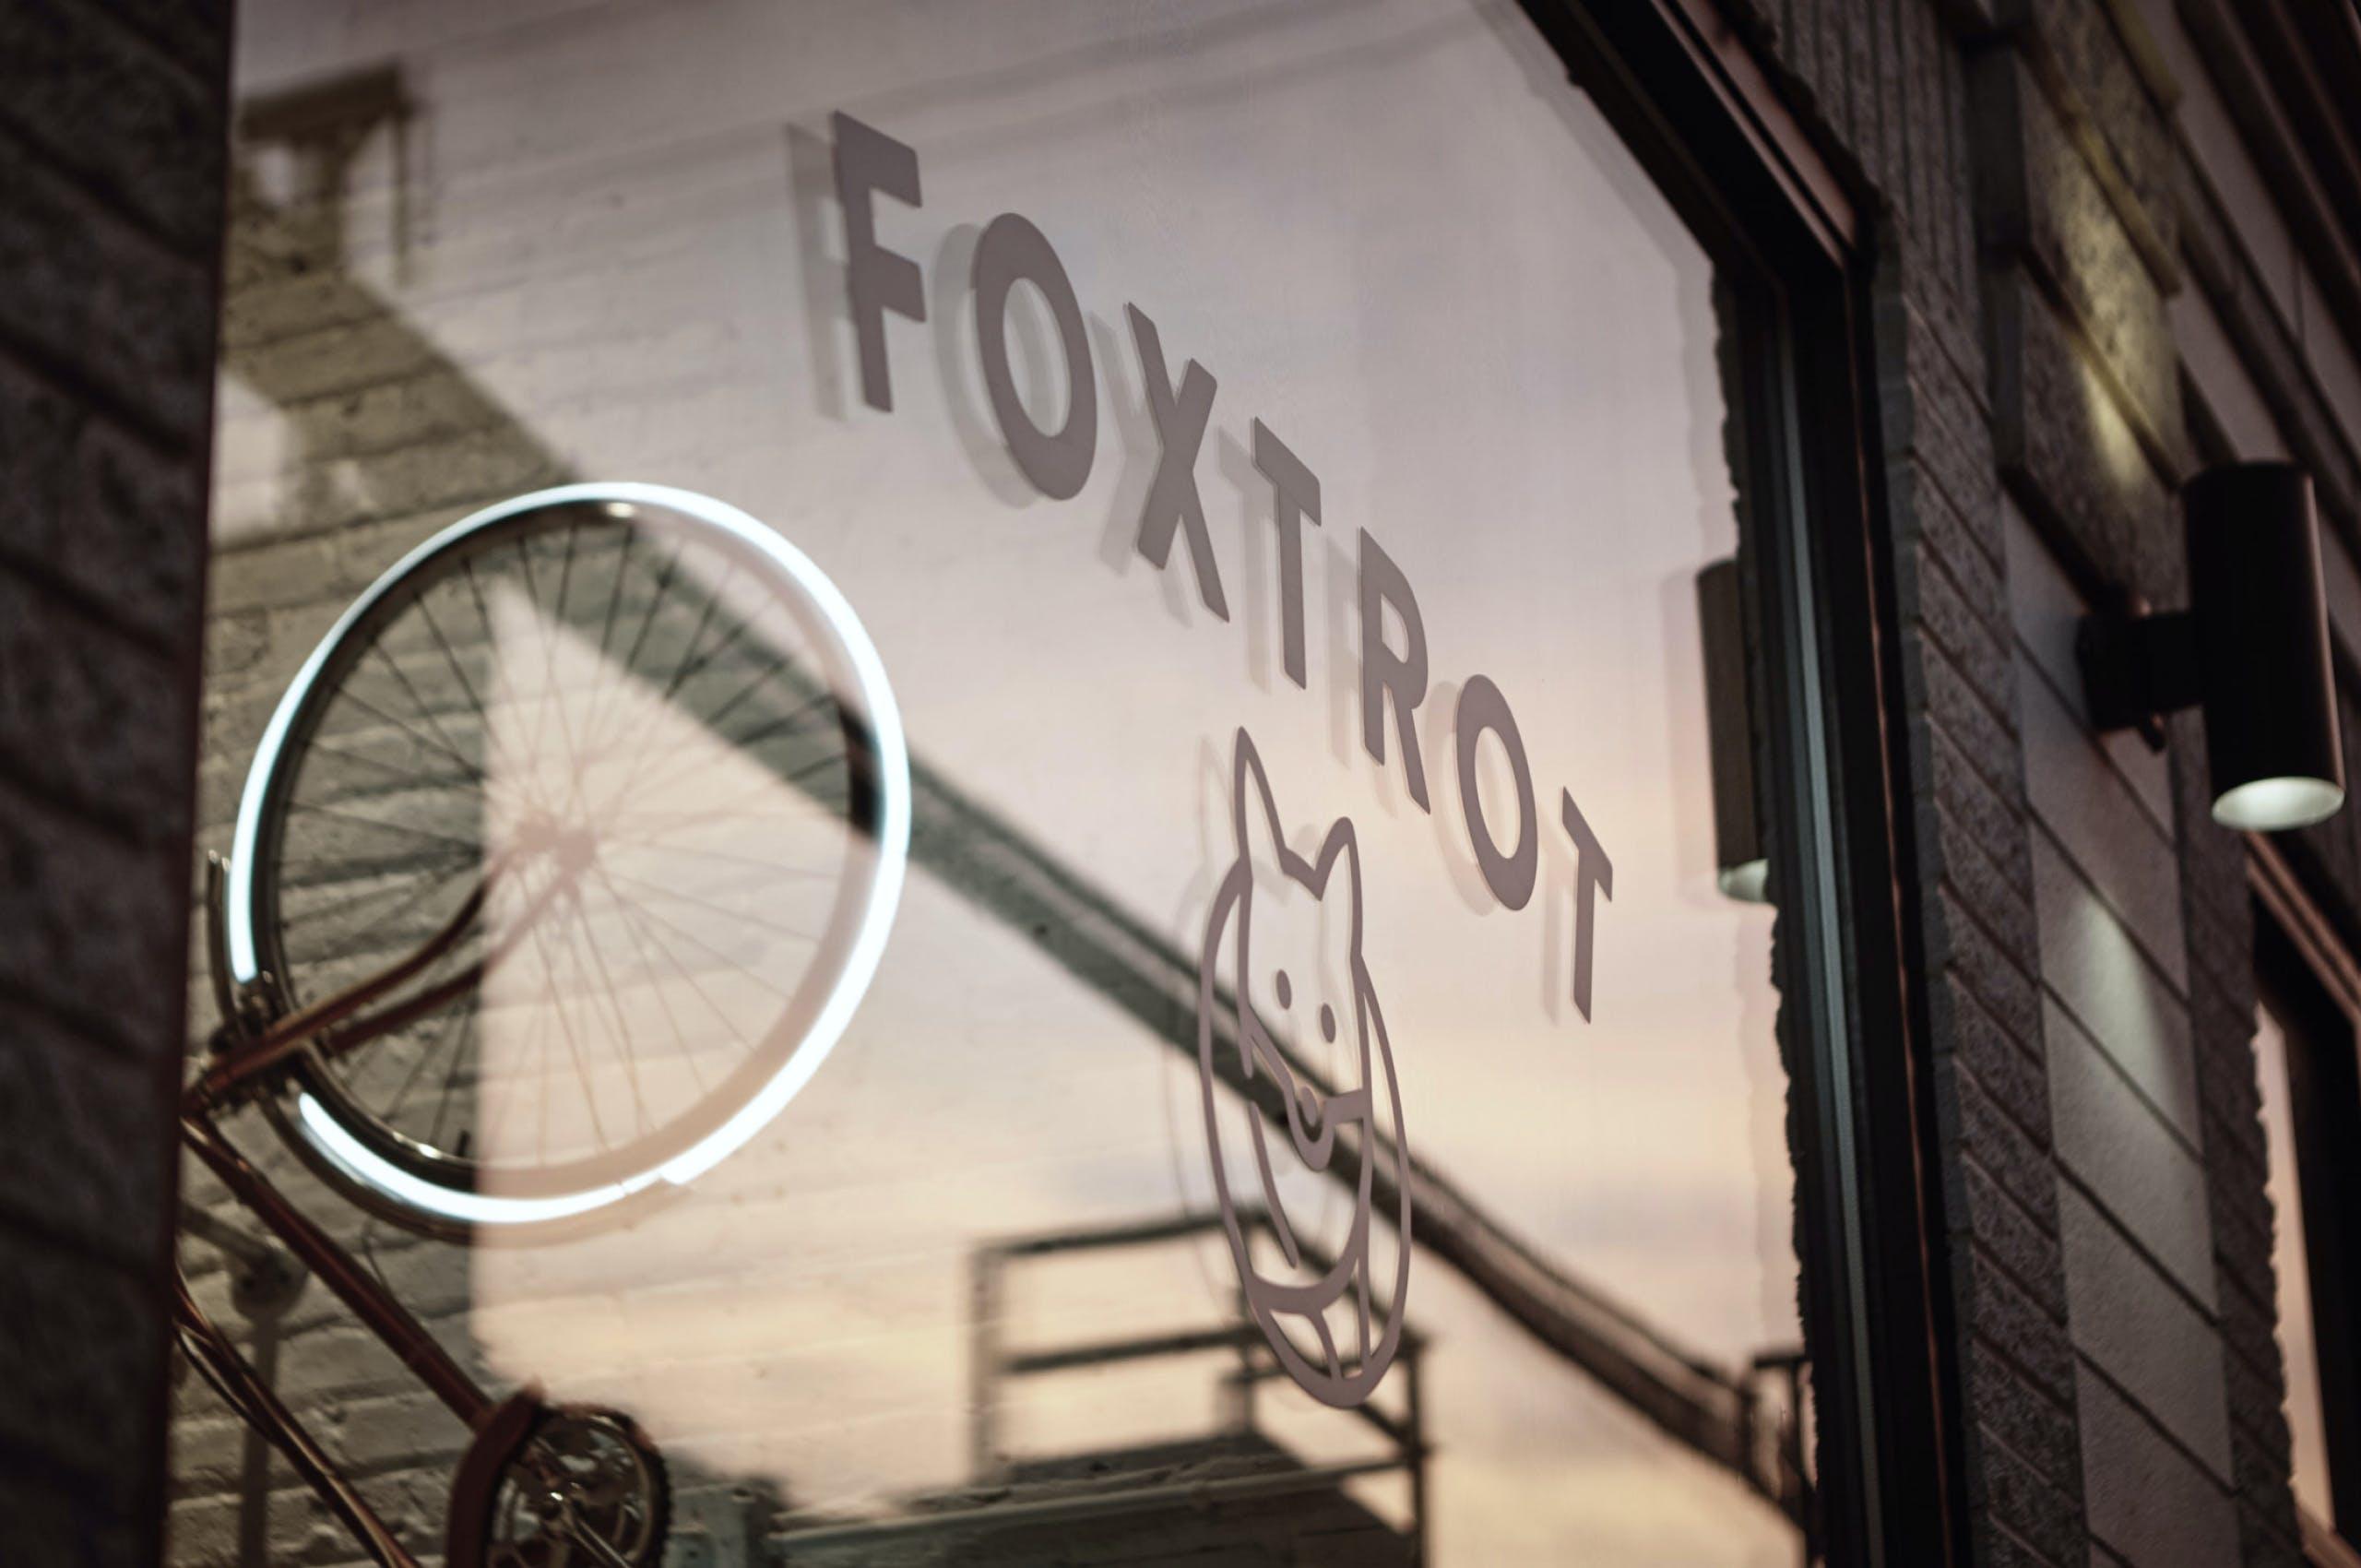 foxtrot-storefront-signage